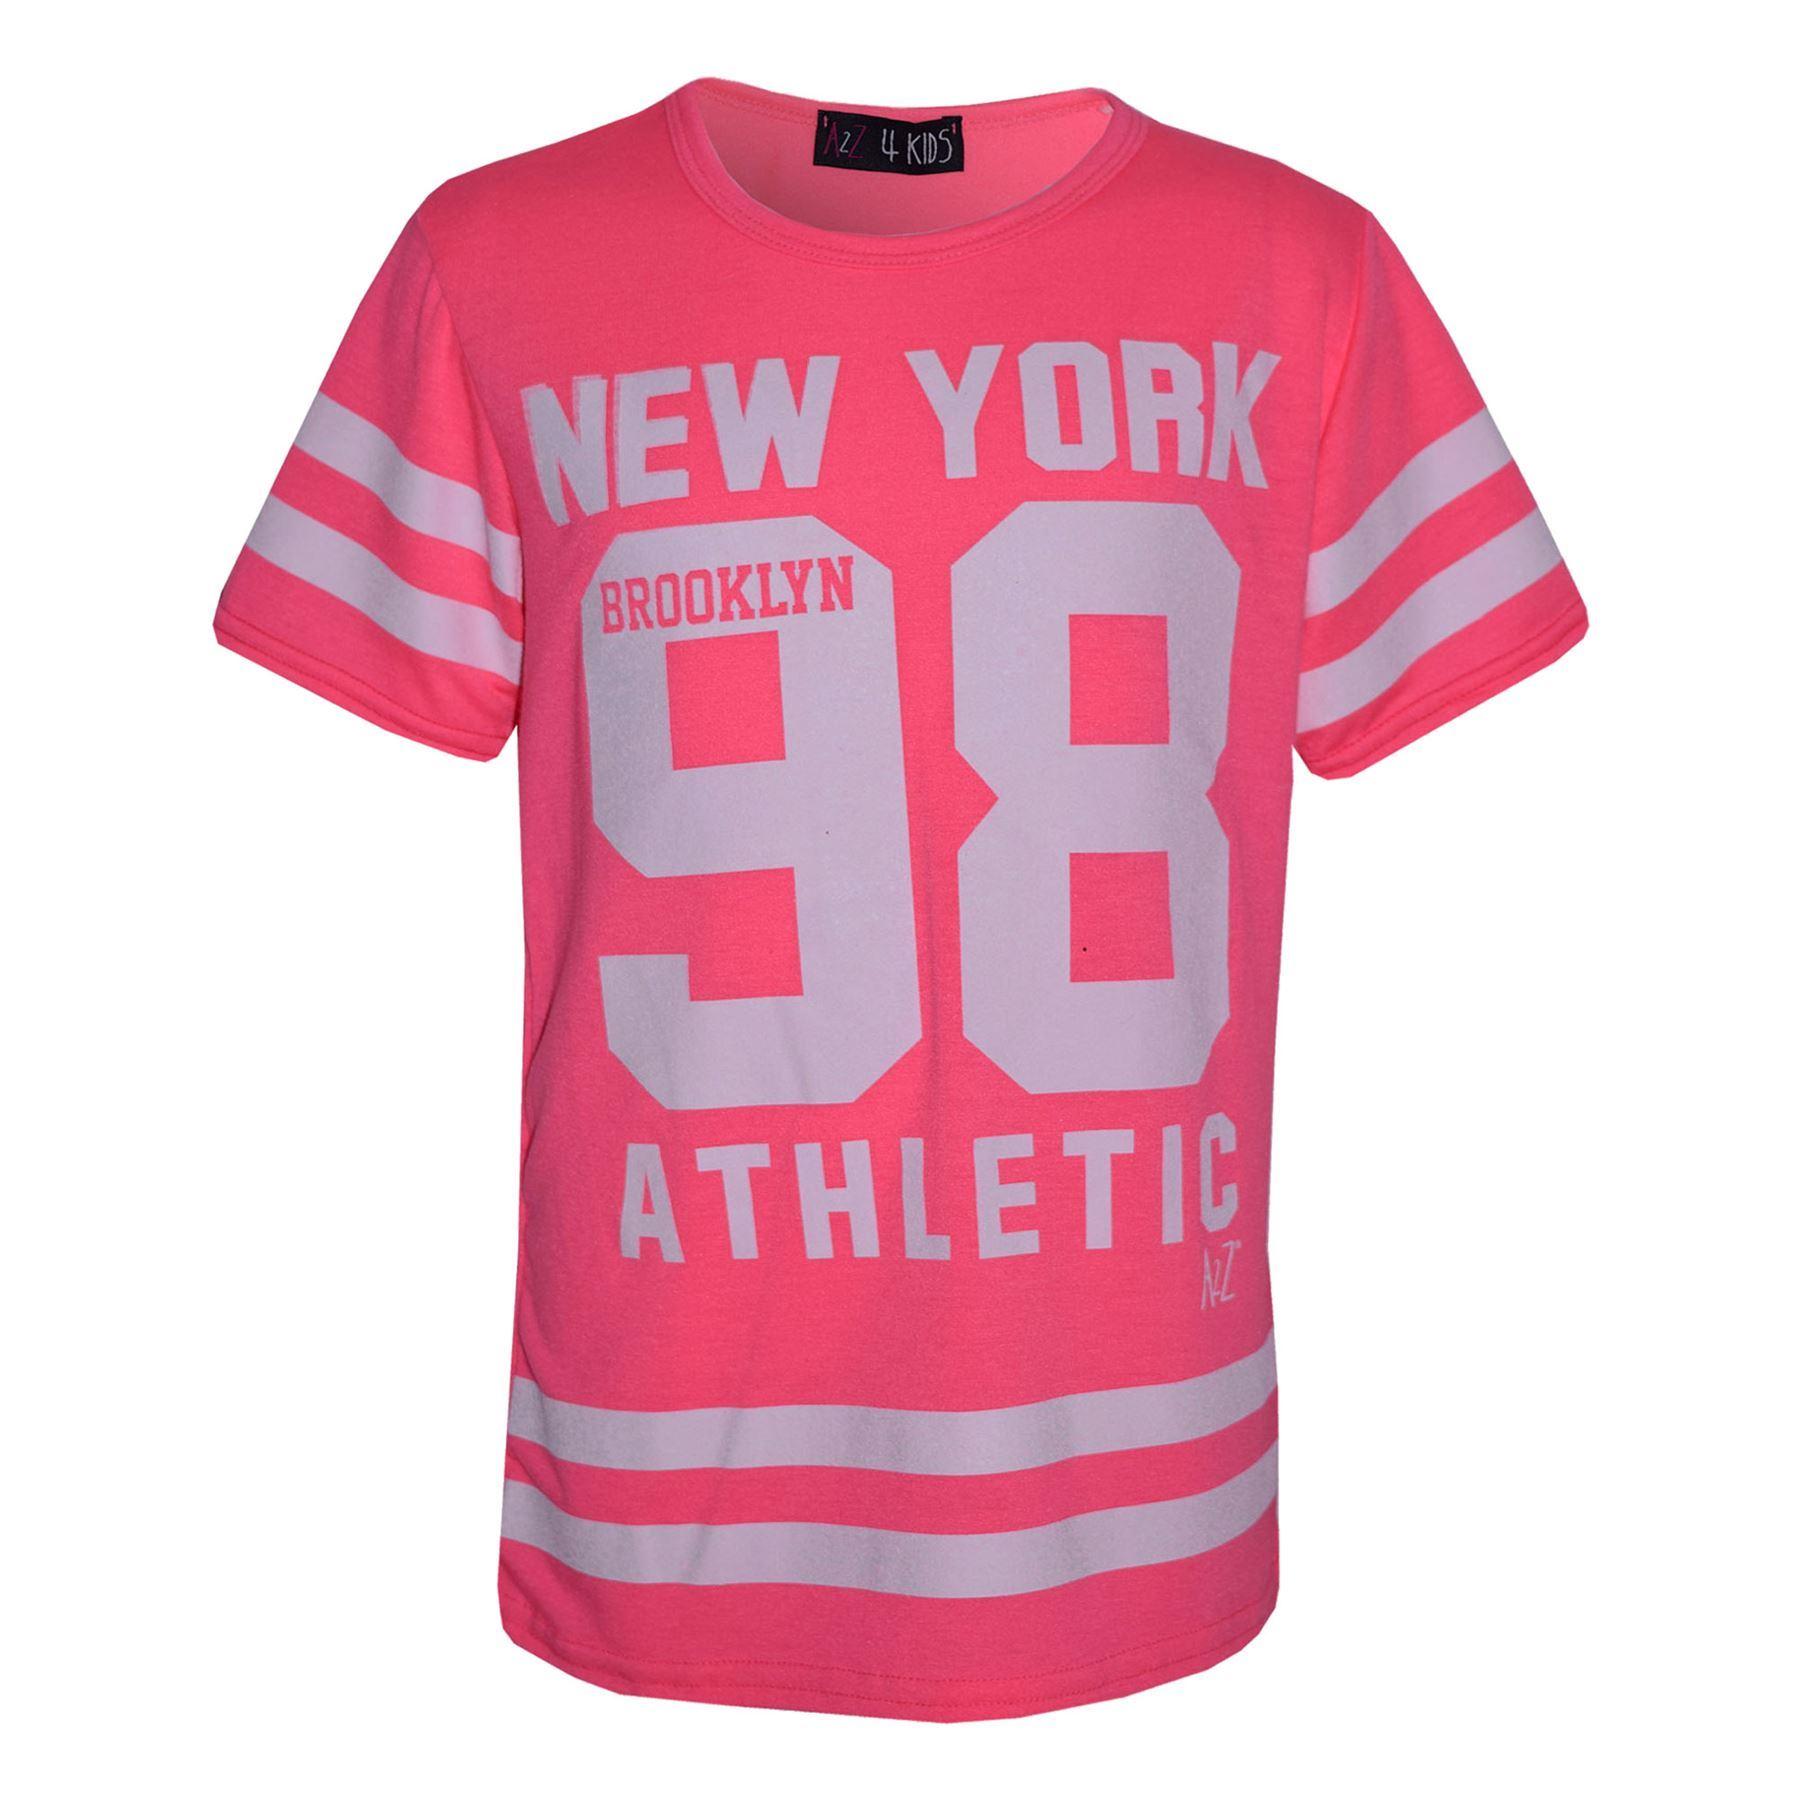 Girls-NEW-YORK-BROOKLYN-98-ATHLECTIC-Camouflage-Print-Top-amp-Legging-Set-7-13-Yr thumbnail 59